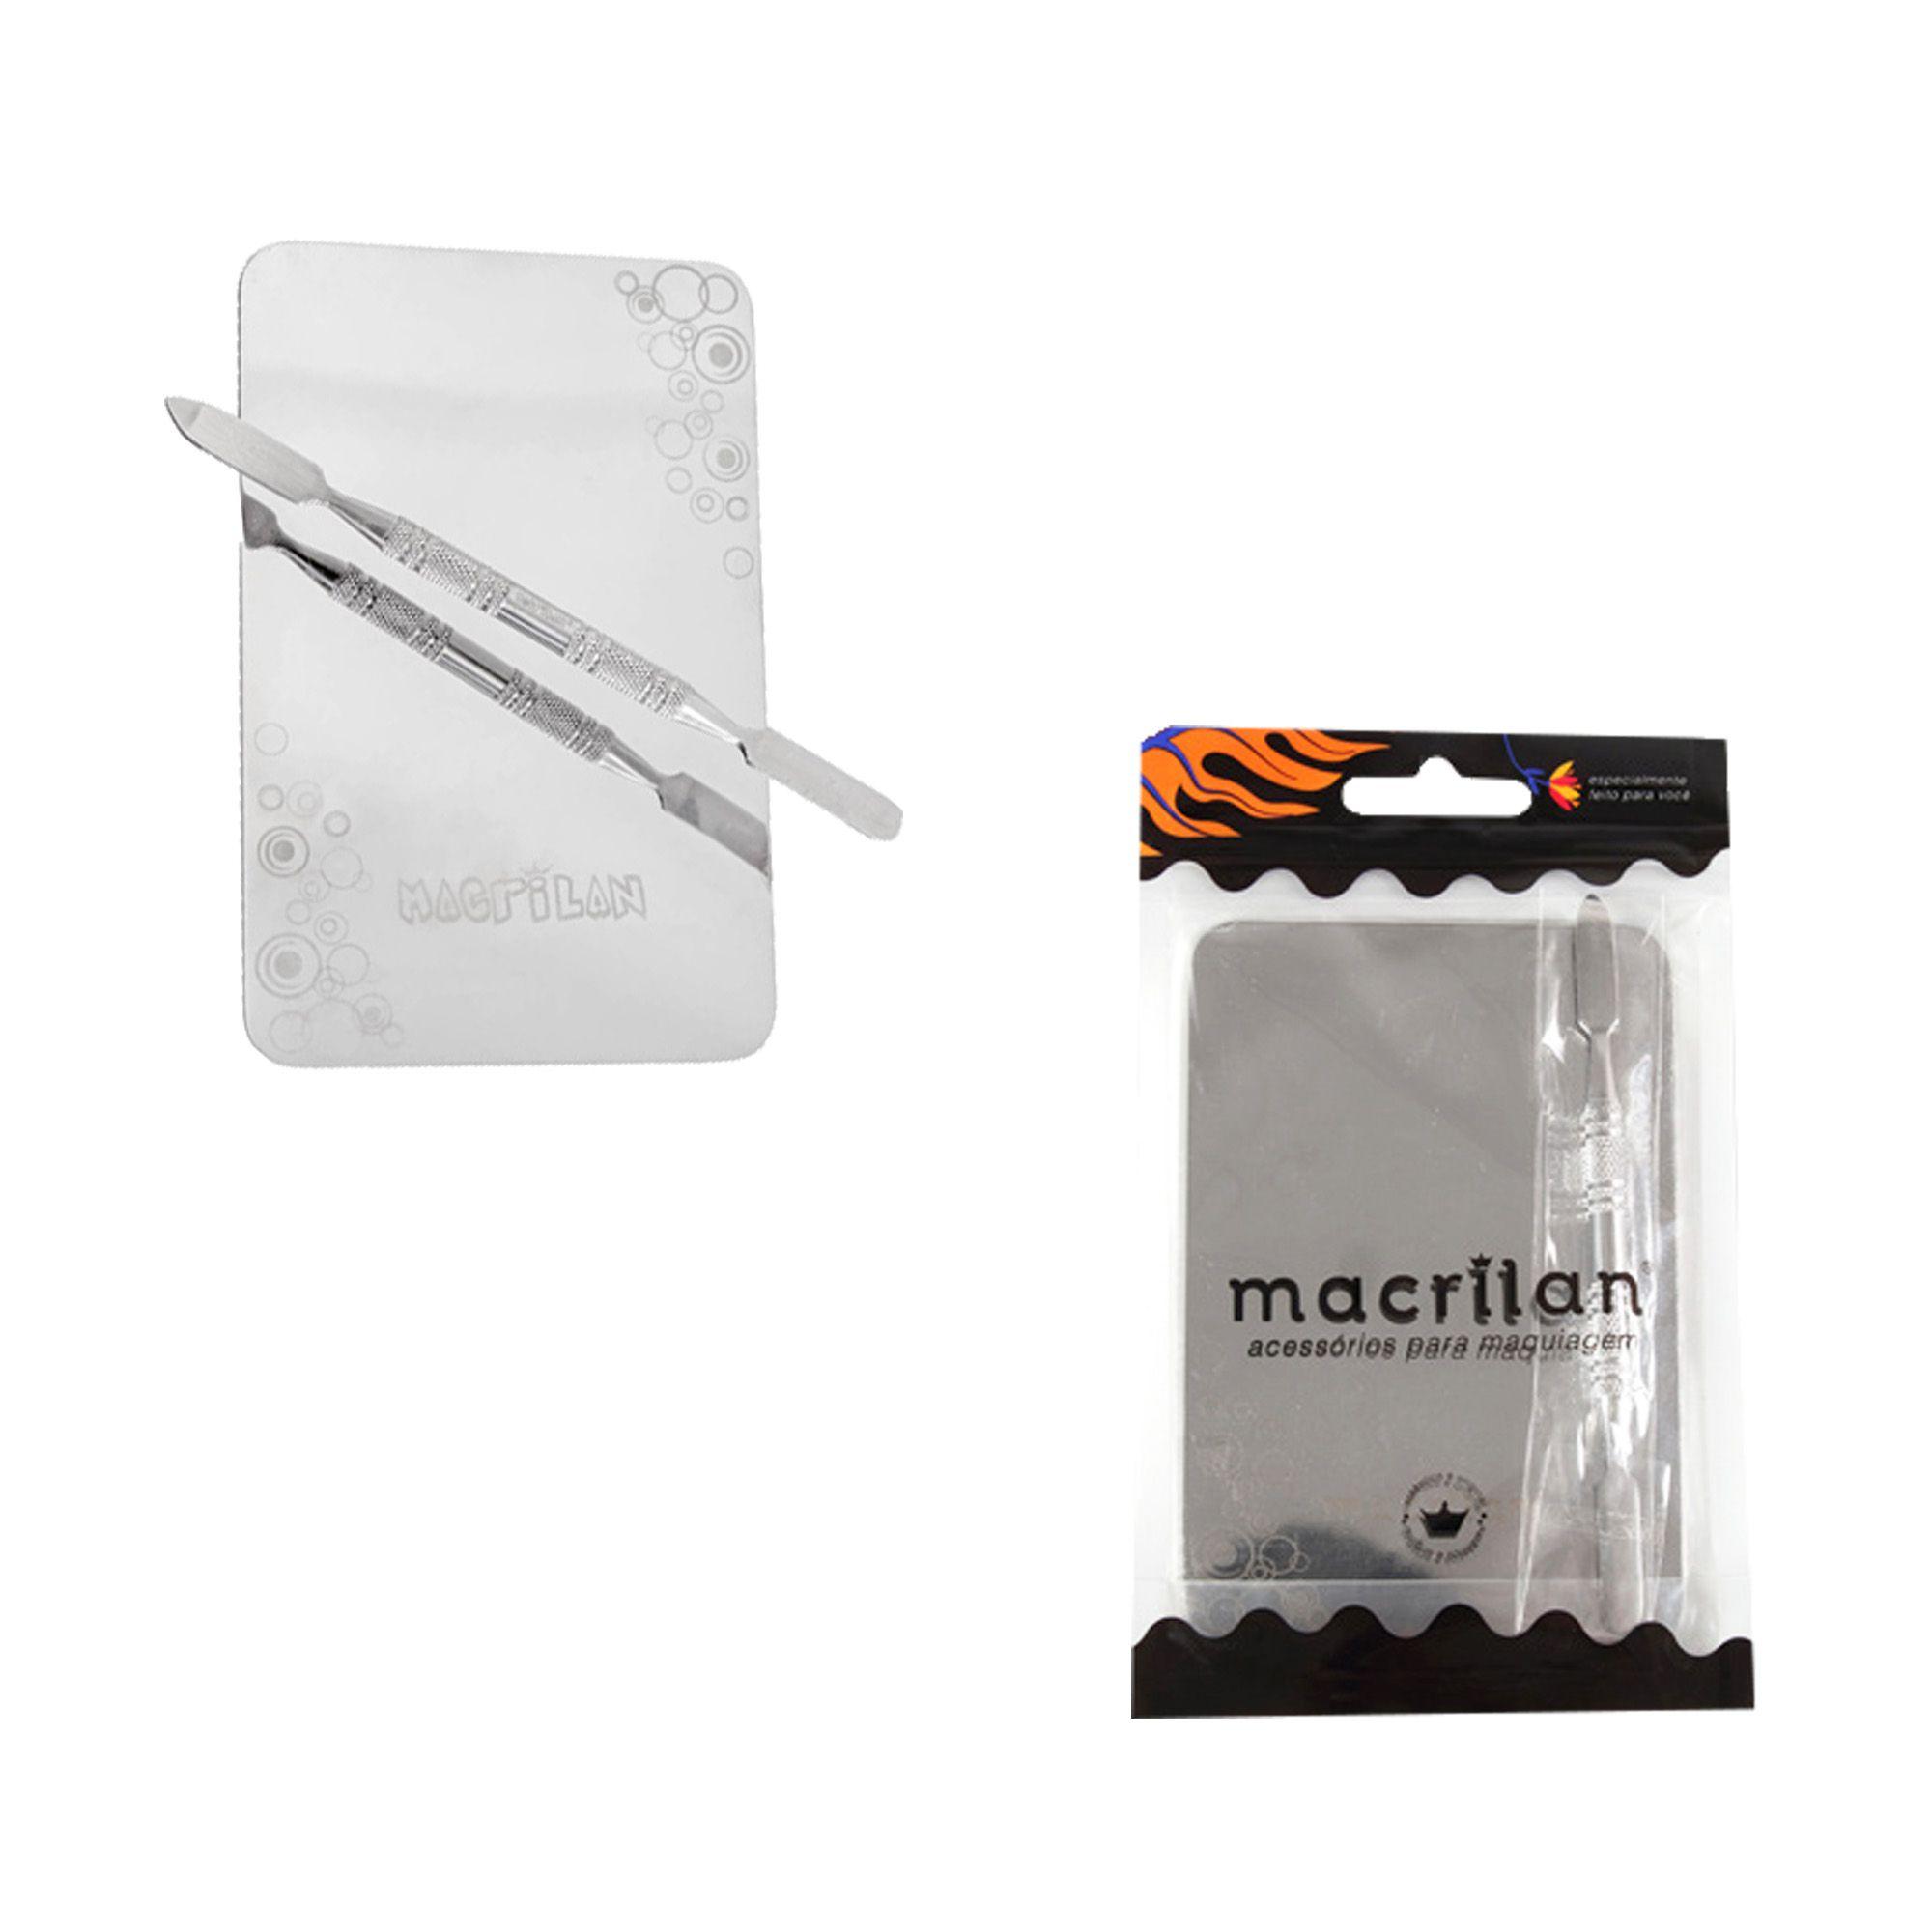 Kit Placa e espátula para maquiagem Macrilan - Mesclador de Líquidos